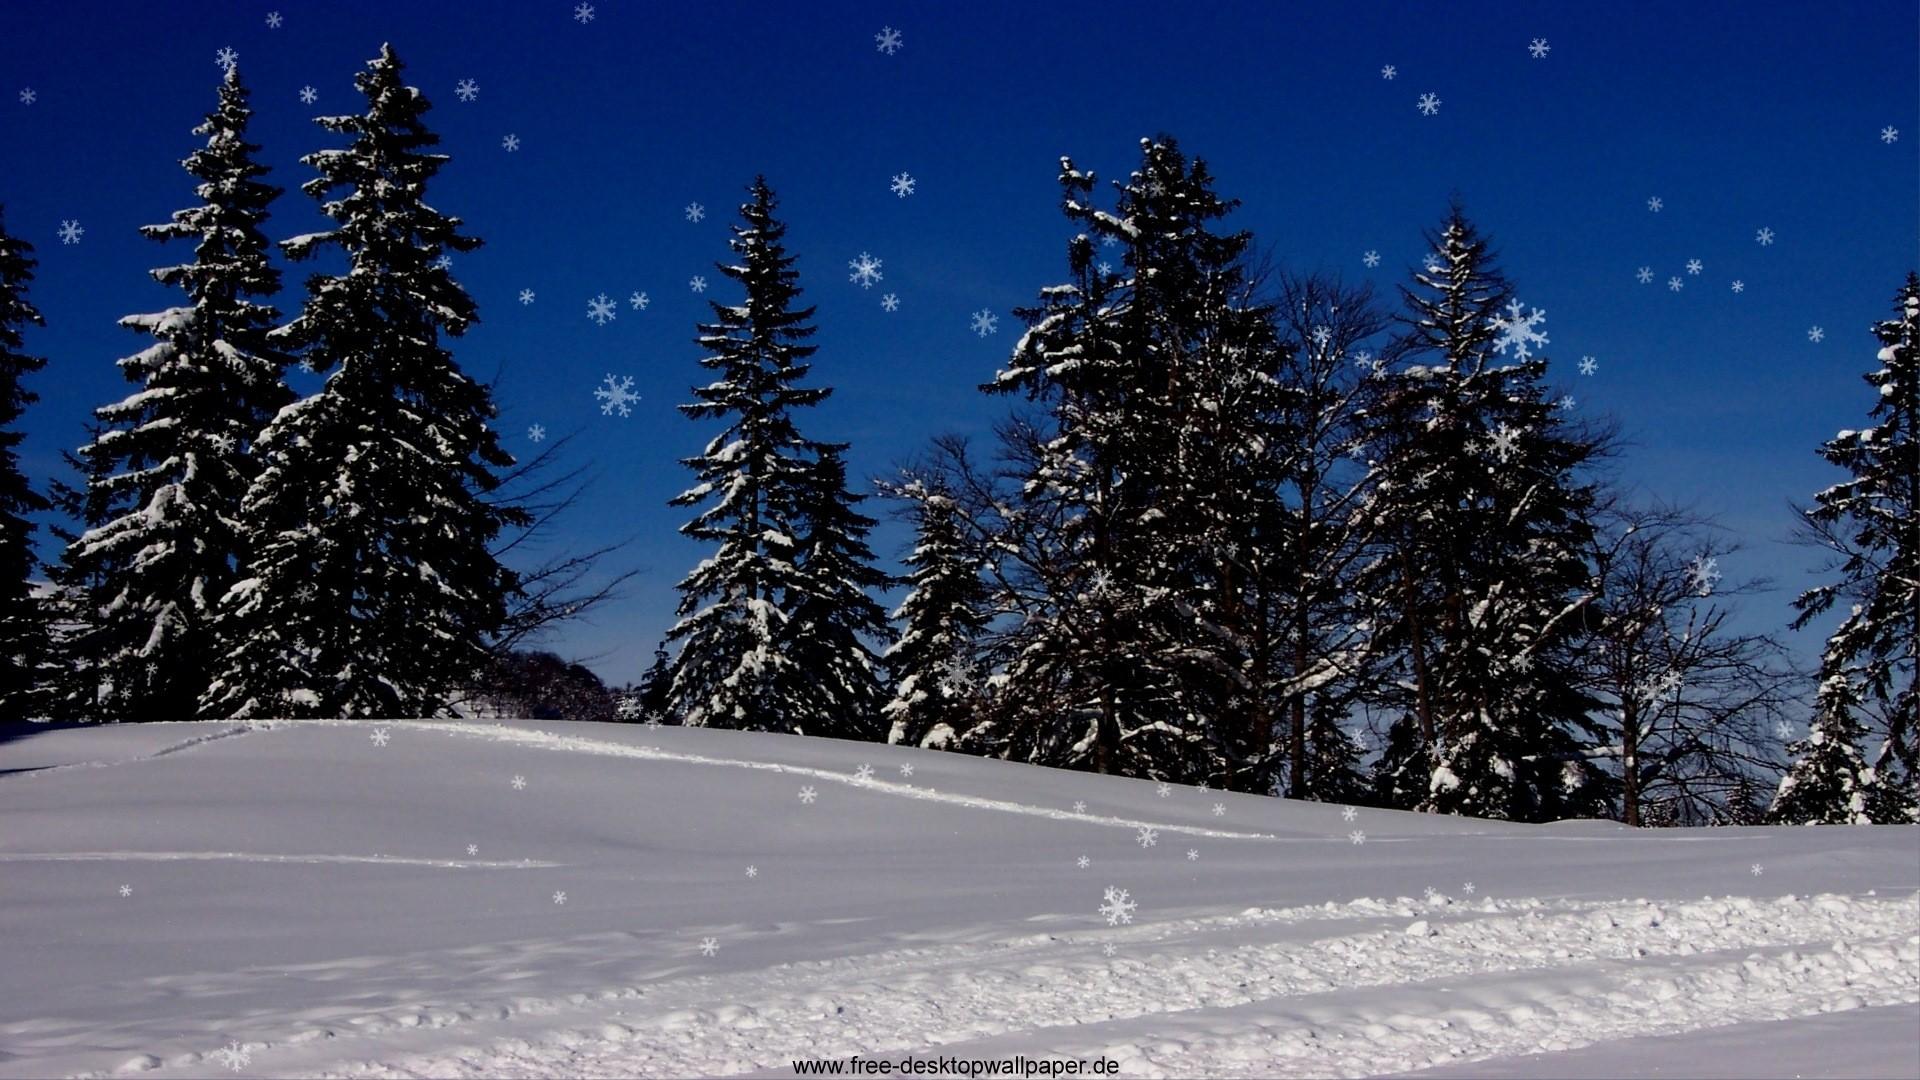 1920x1080 Wallpaper Night Snow Height City Winter